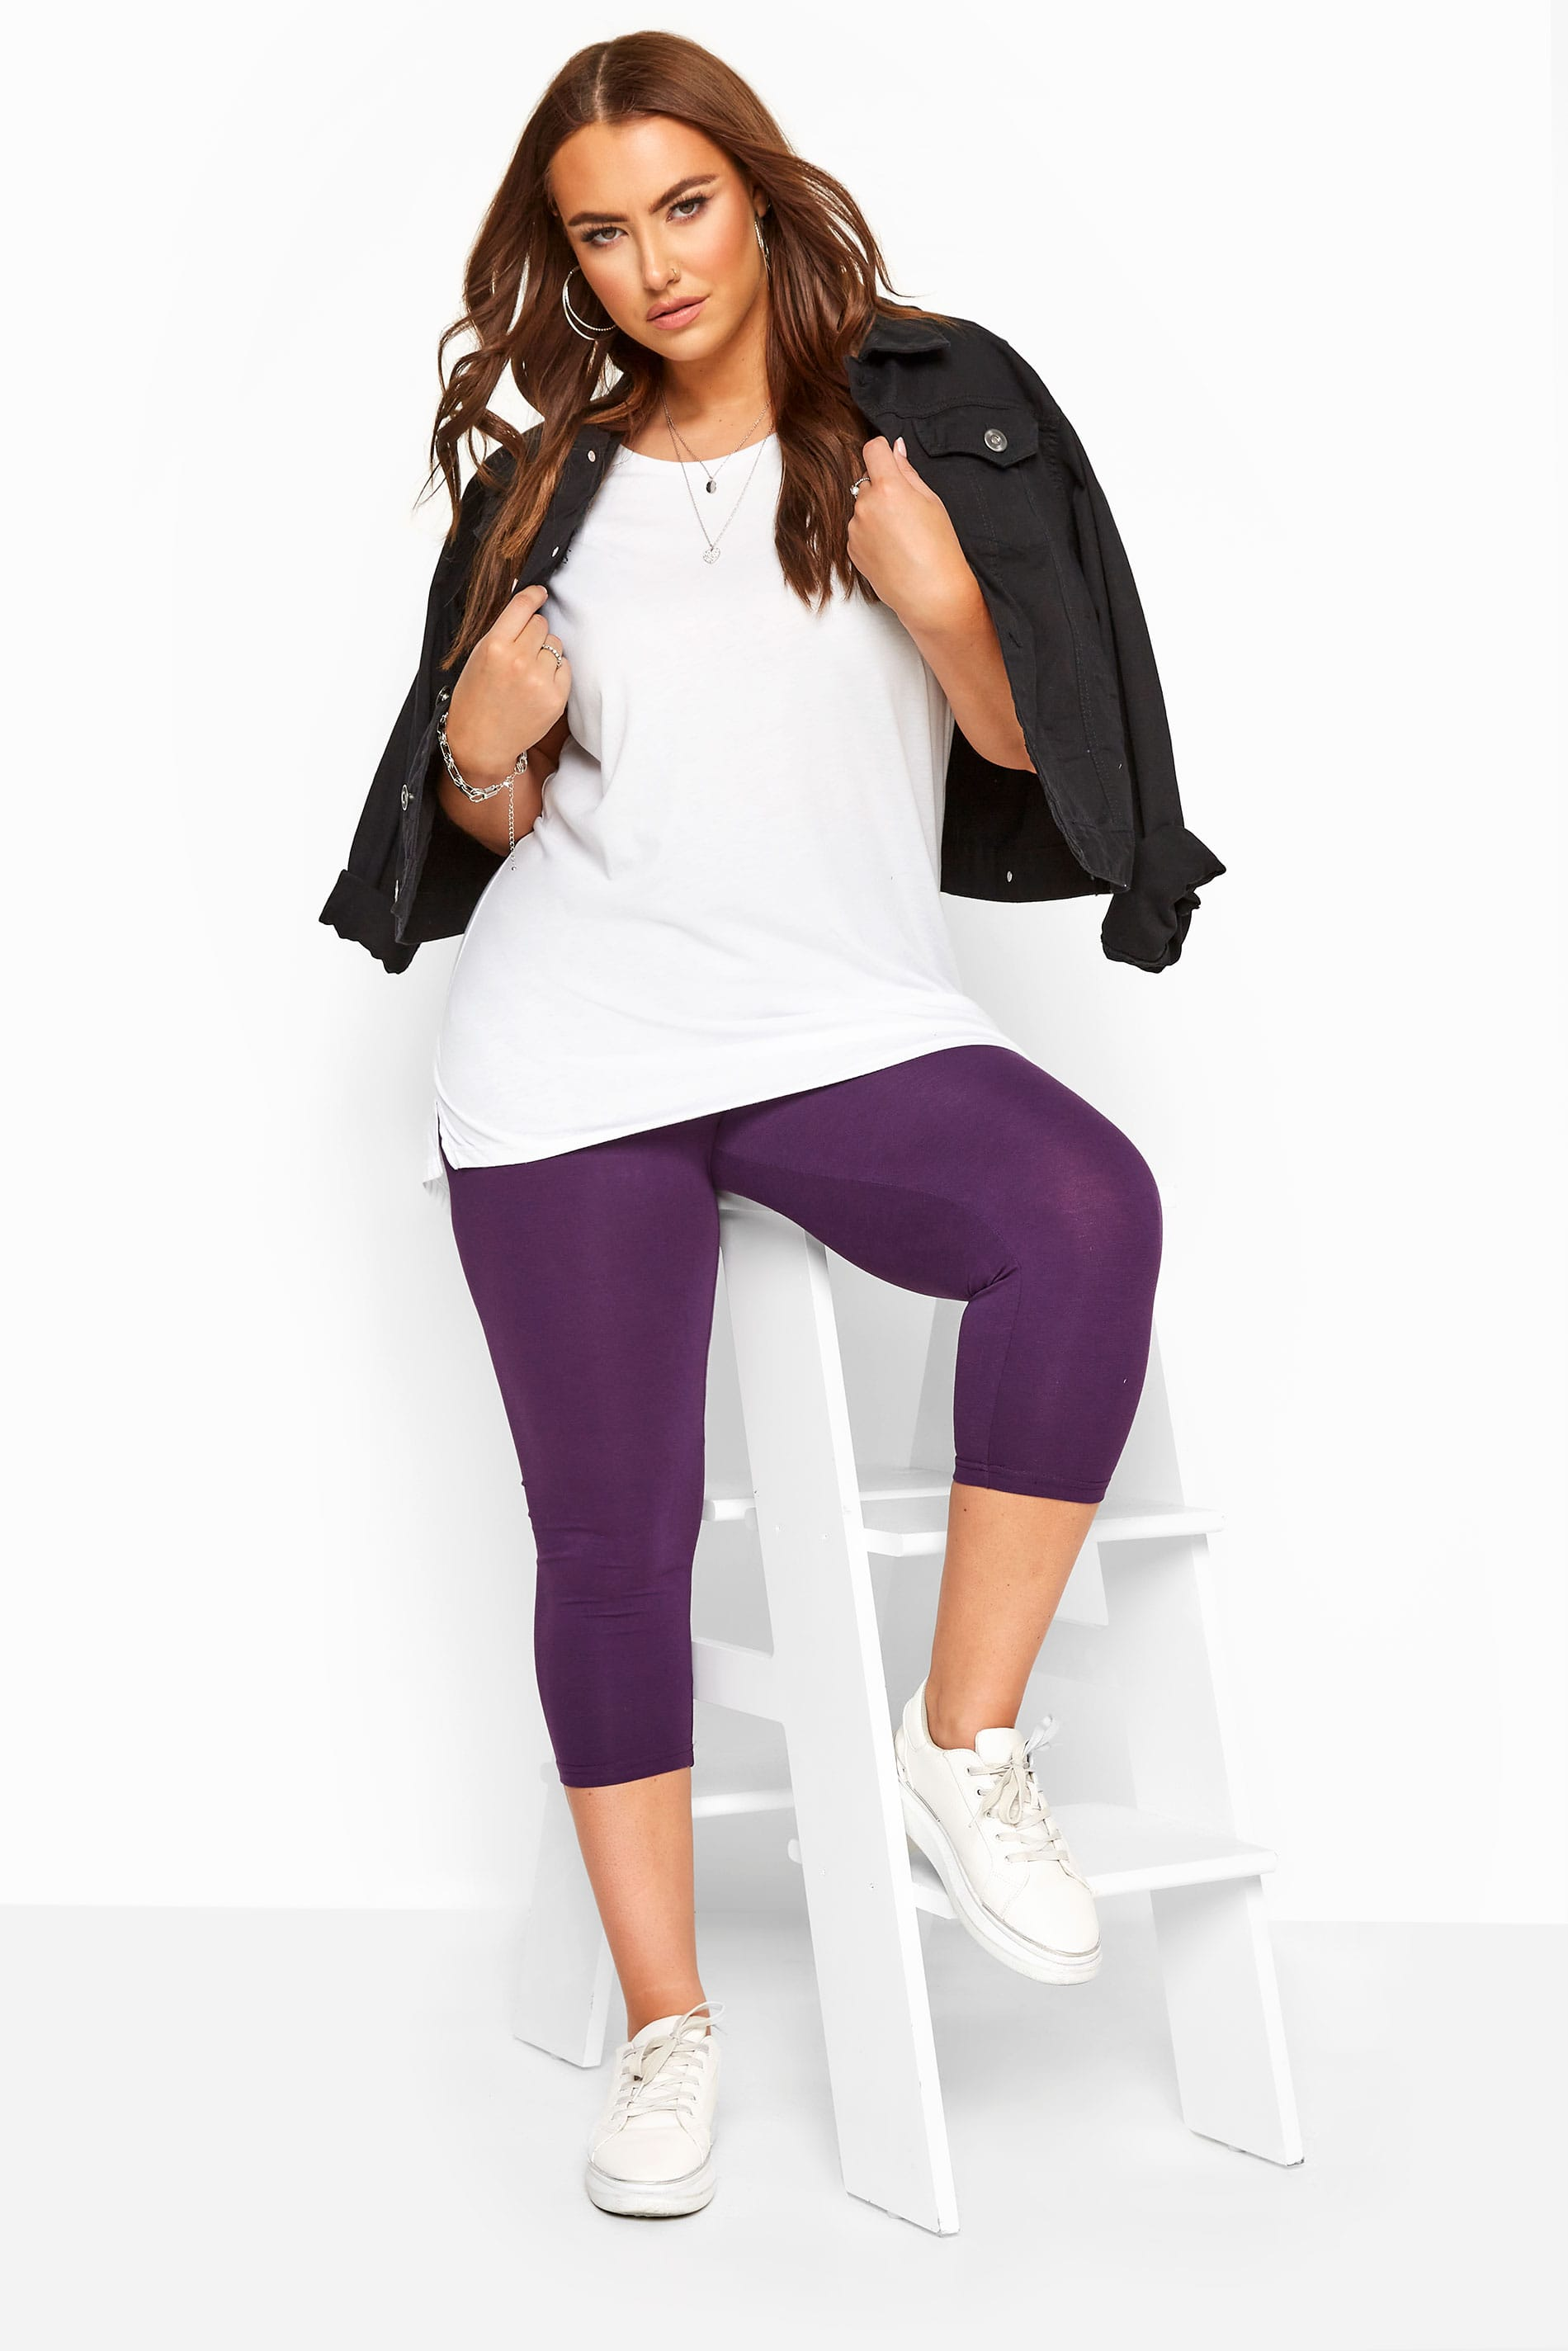 Yours Clothing Ladies Legging Viscose//Elastane Stretch Machine Wash Purple